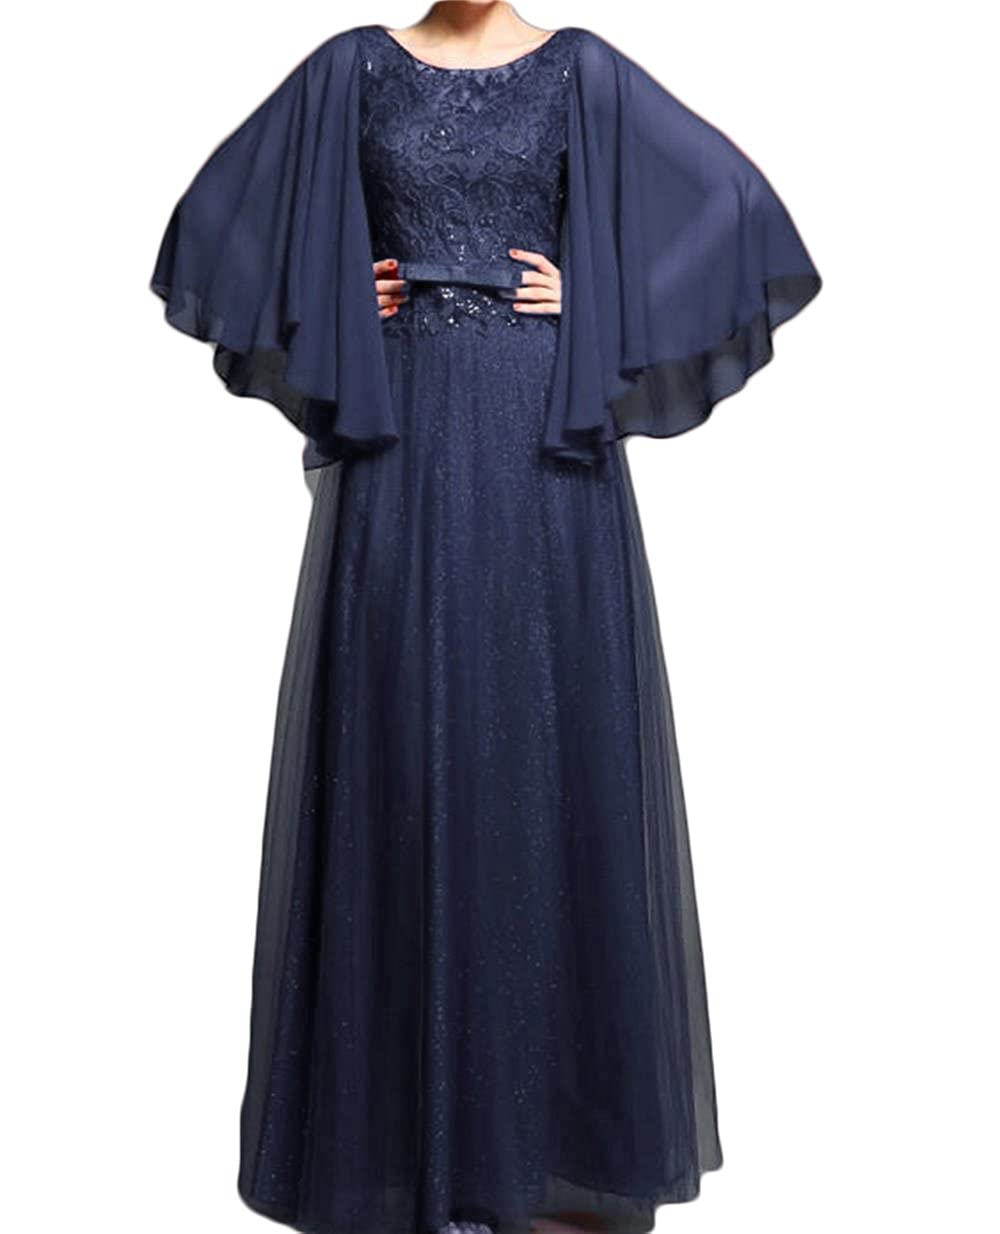 Navy bluee Dydsz Women's Evening Formal Dresses Prom Dress Long Sleeves A Line Backless D215